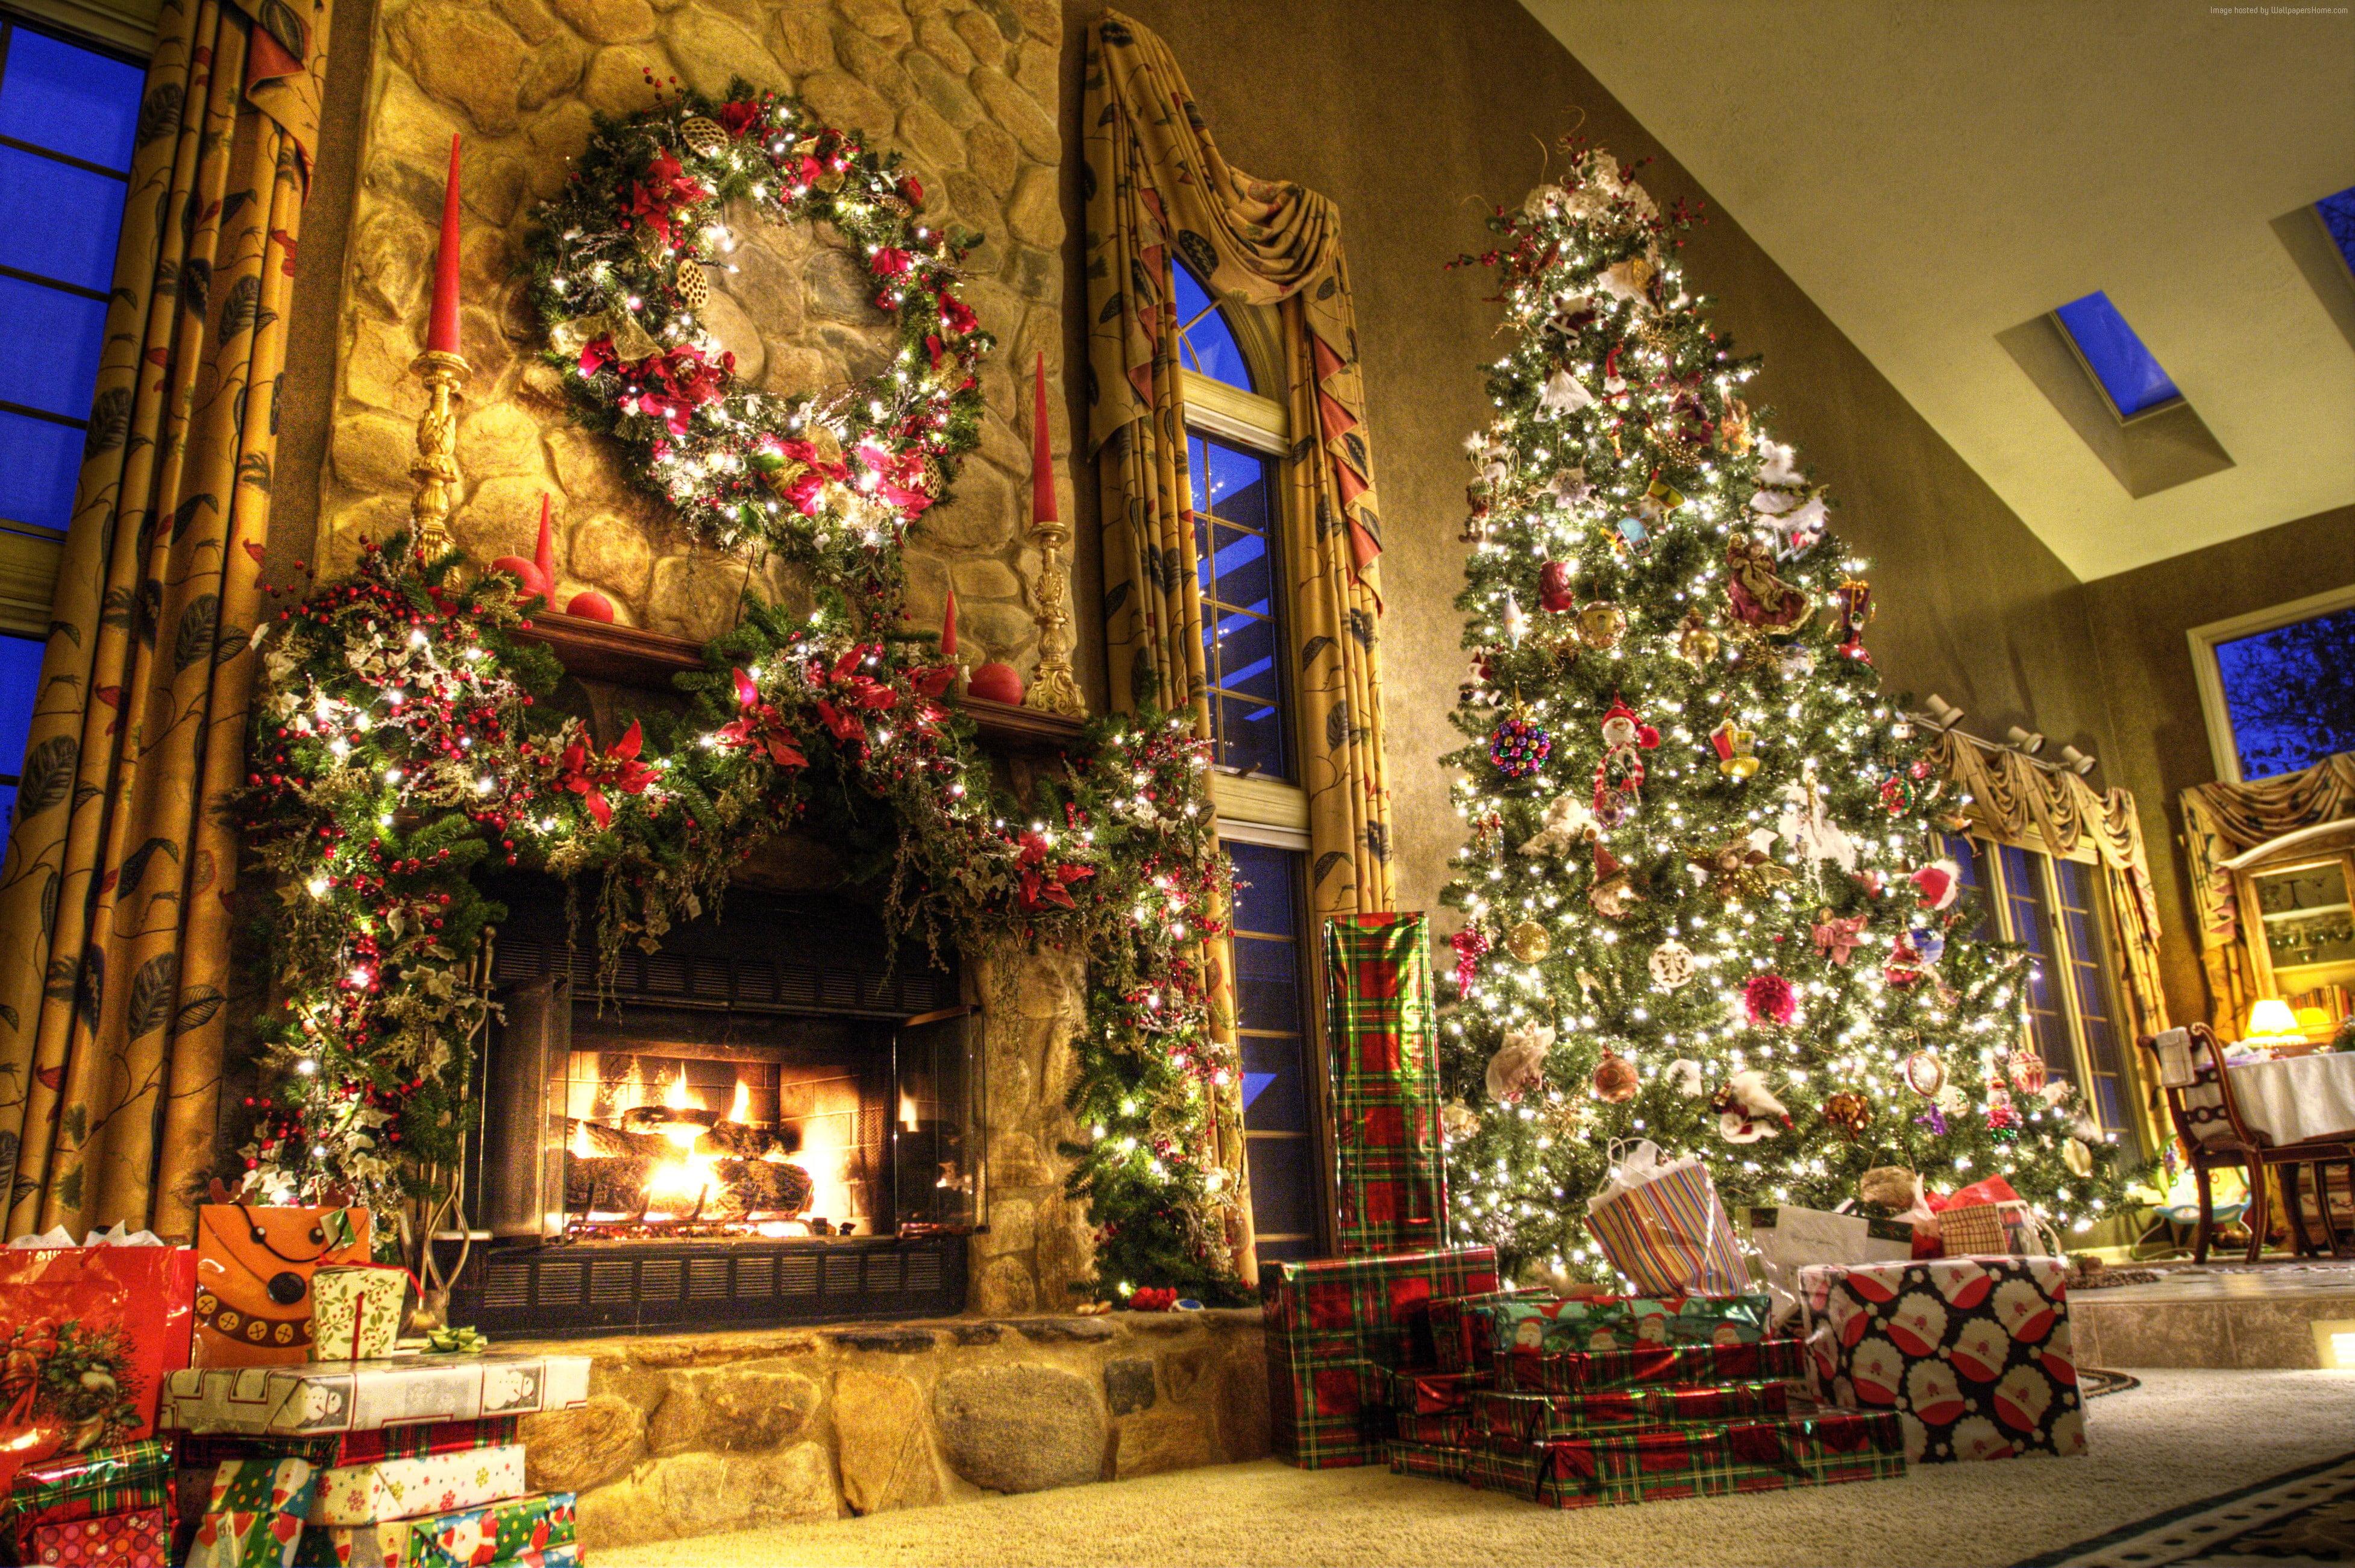 Lighted green Christmas tree near lighted fireplace HD wallpaper 3908x2602